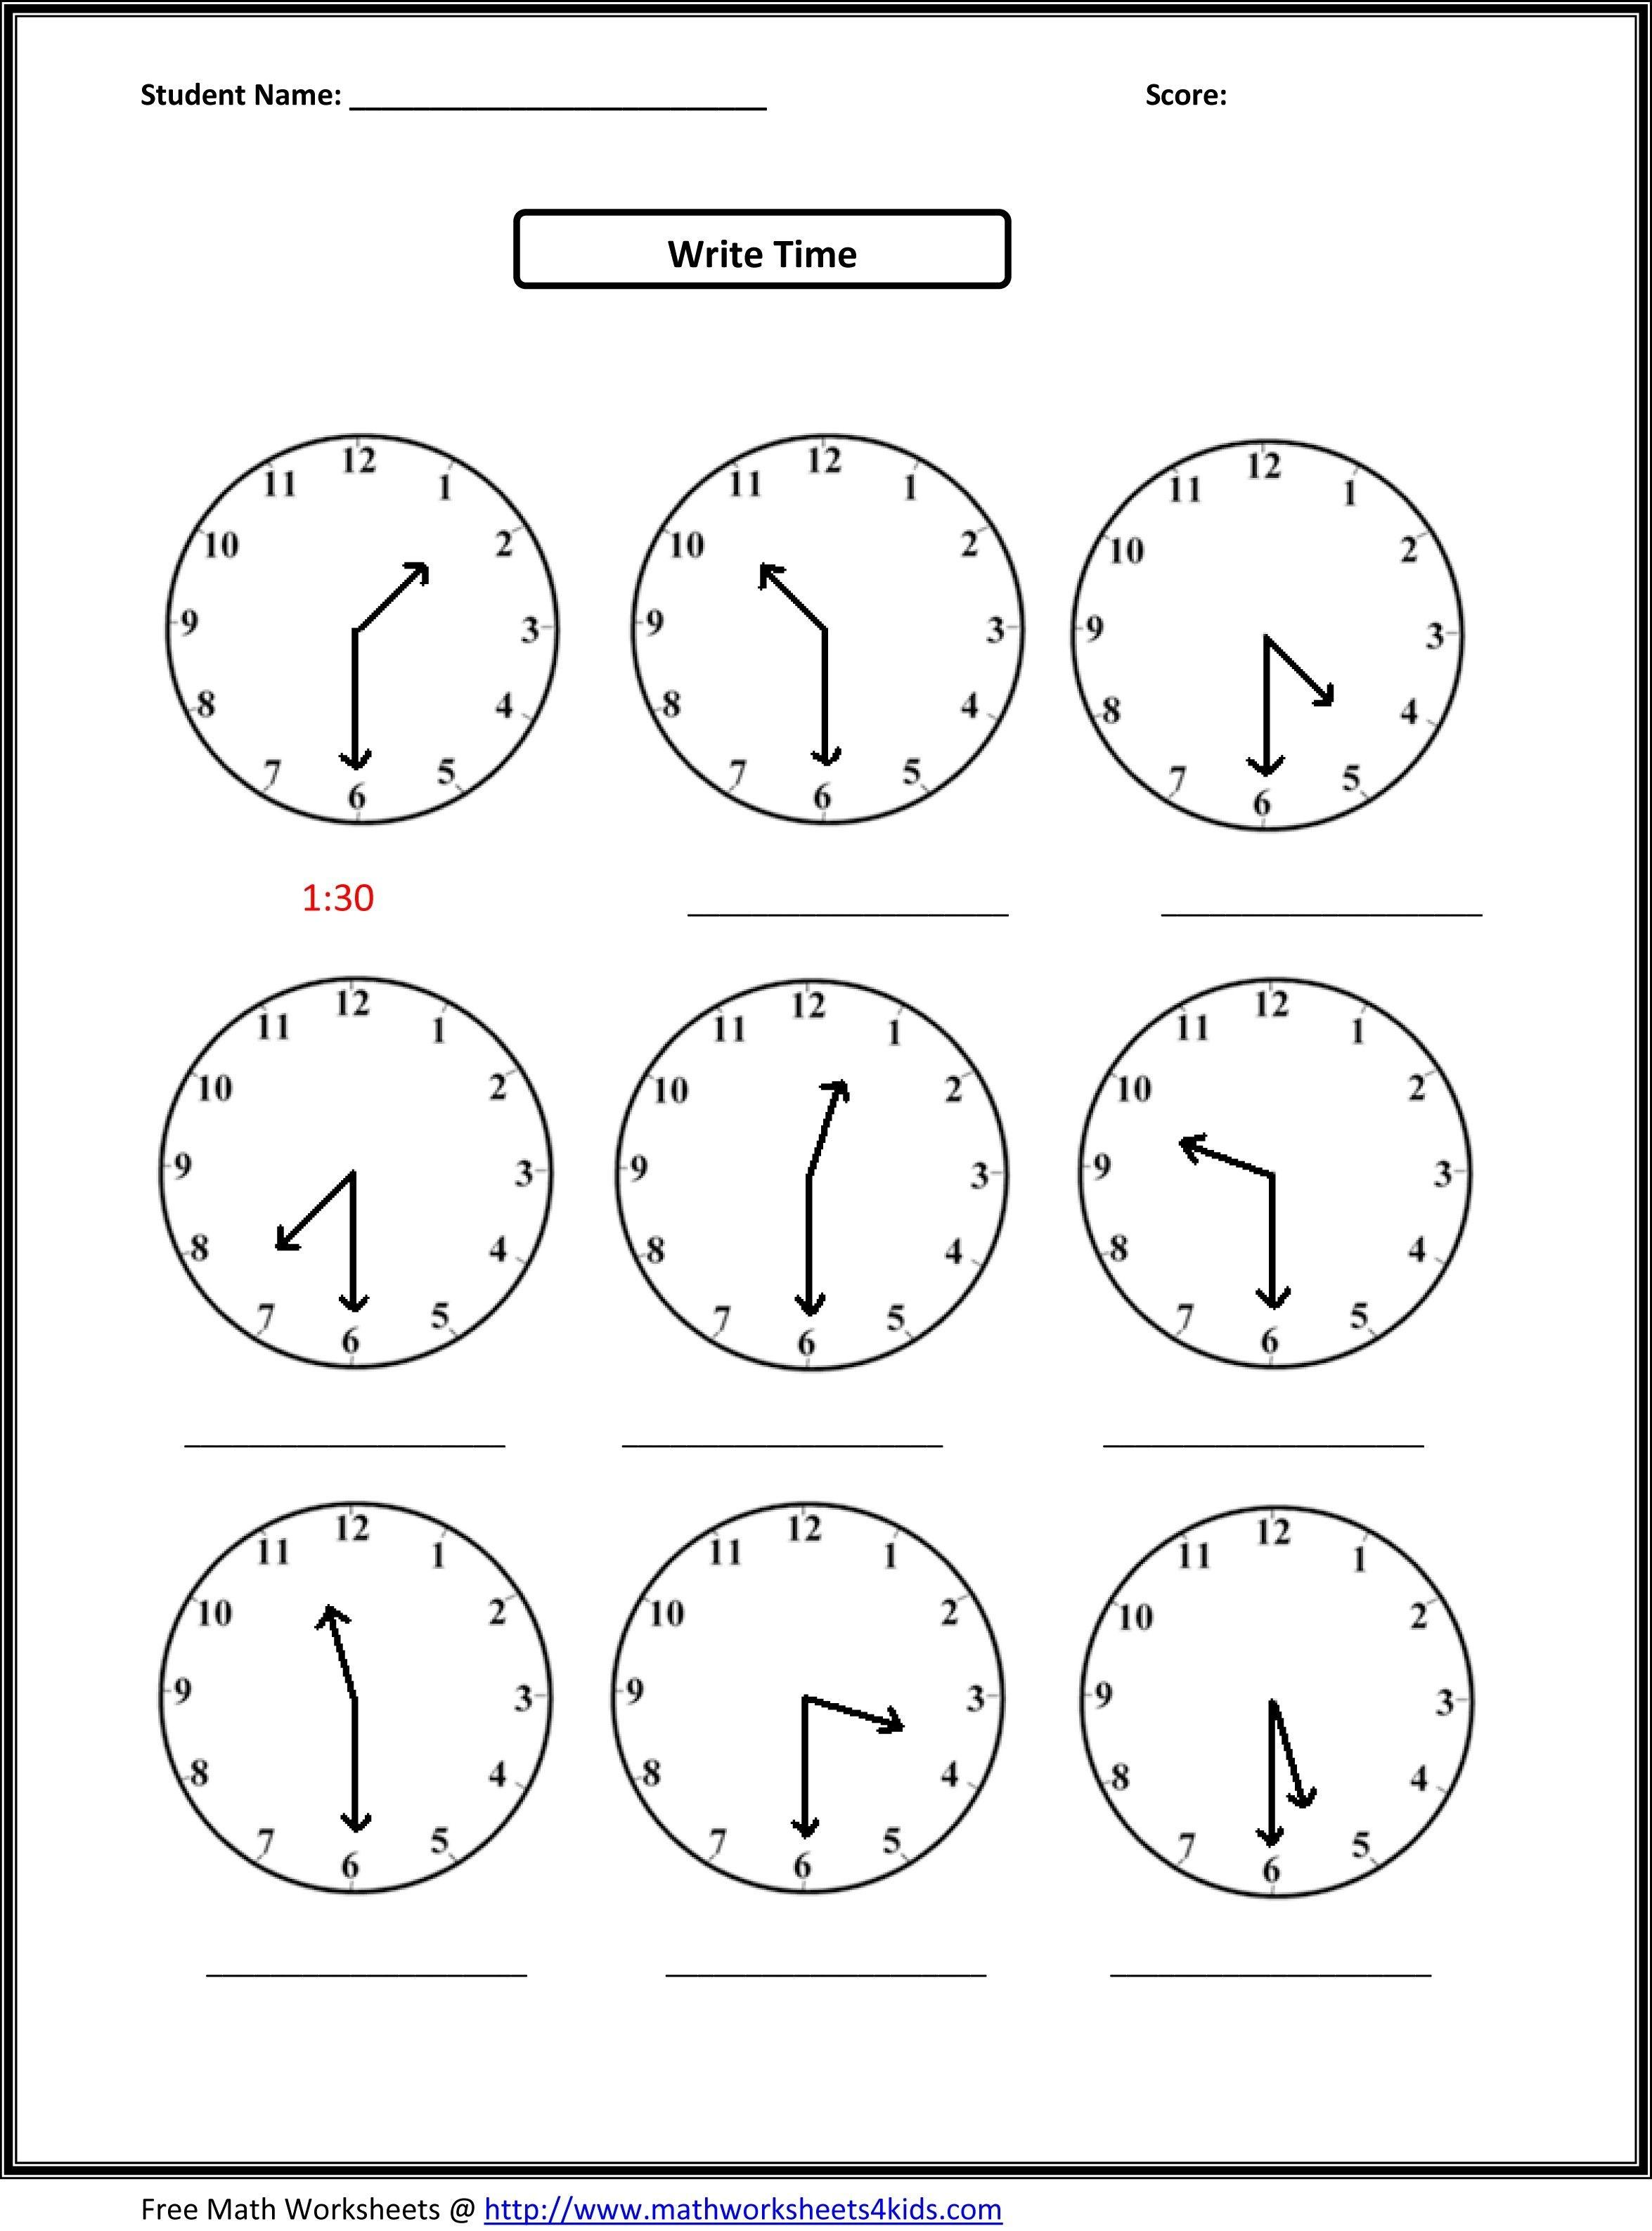 2Nd Grade Free Worksheets Math | Math: Time/measurement | 2Nd Grade - Free Printable Time Worksheets For Kindergarten